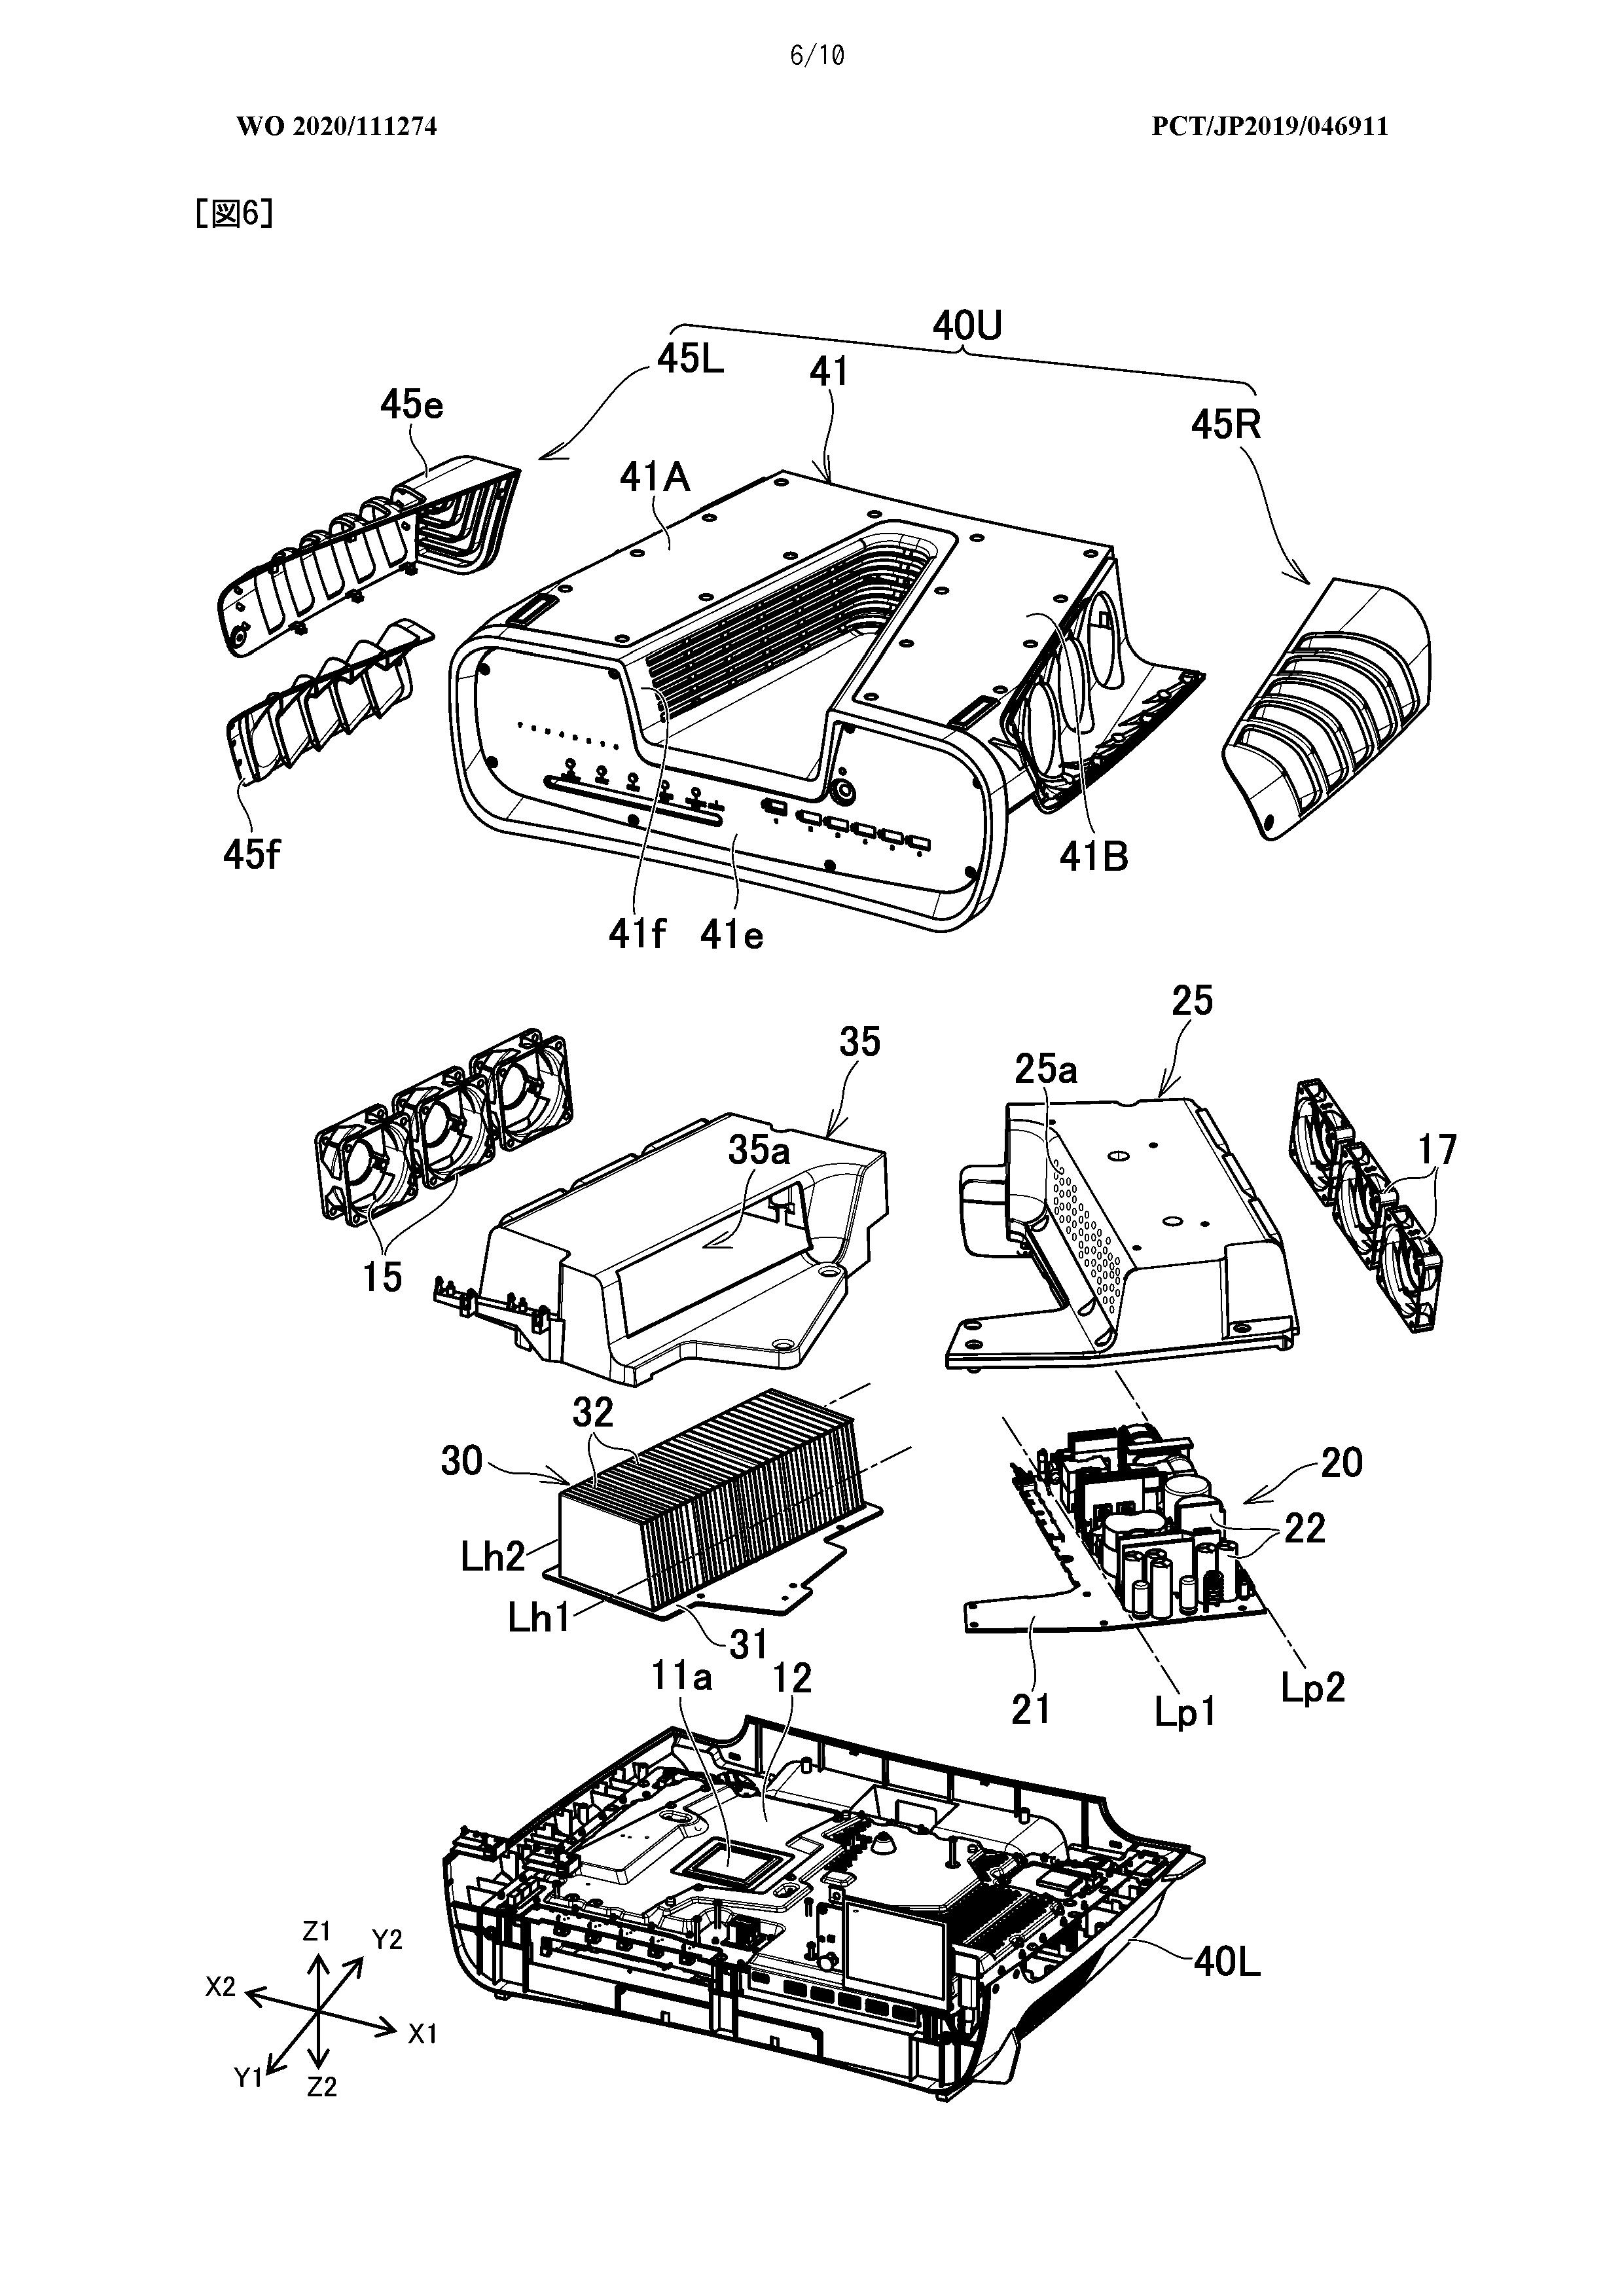 PS5 devkit patent